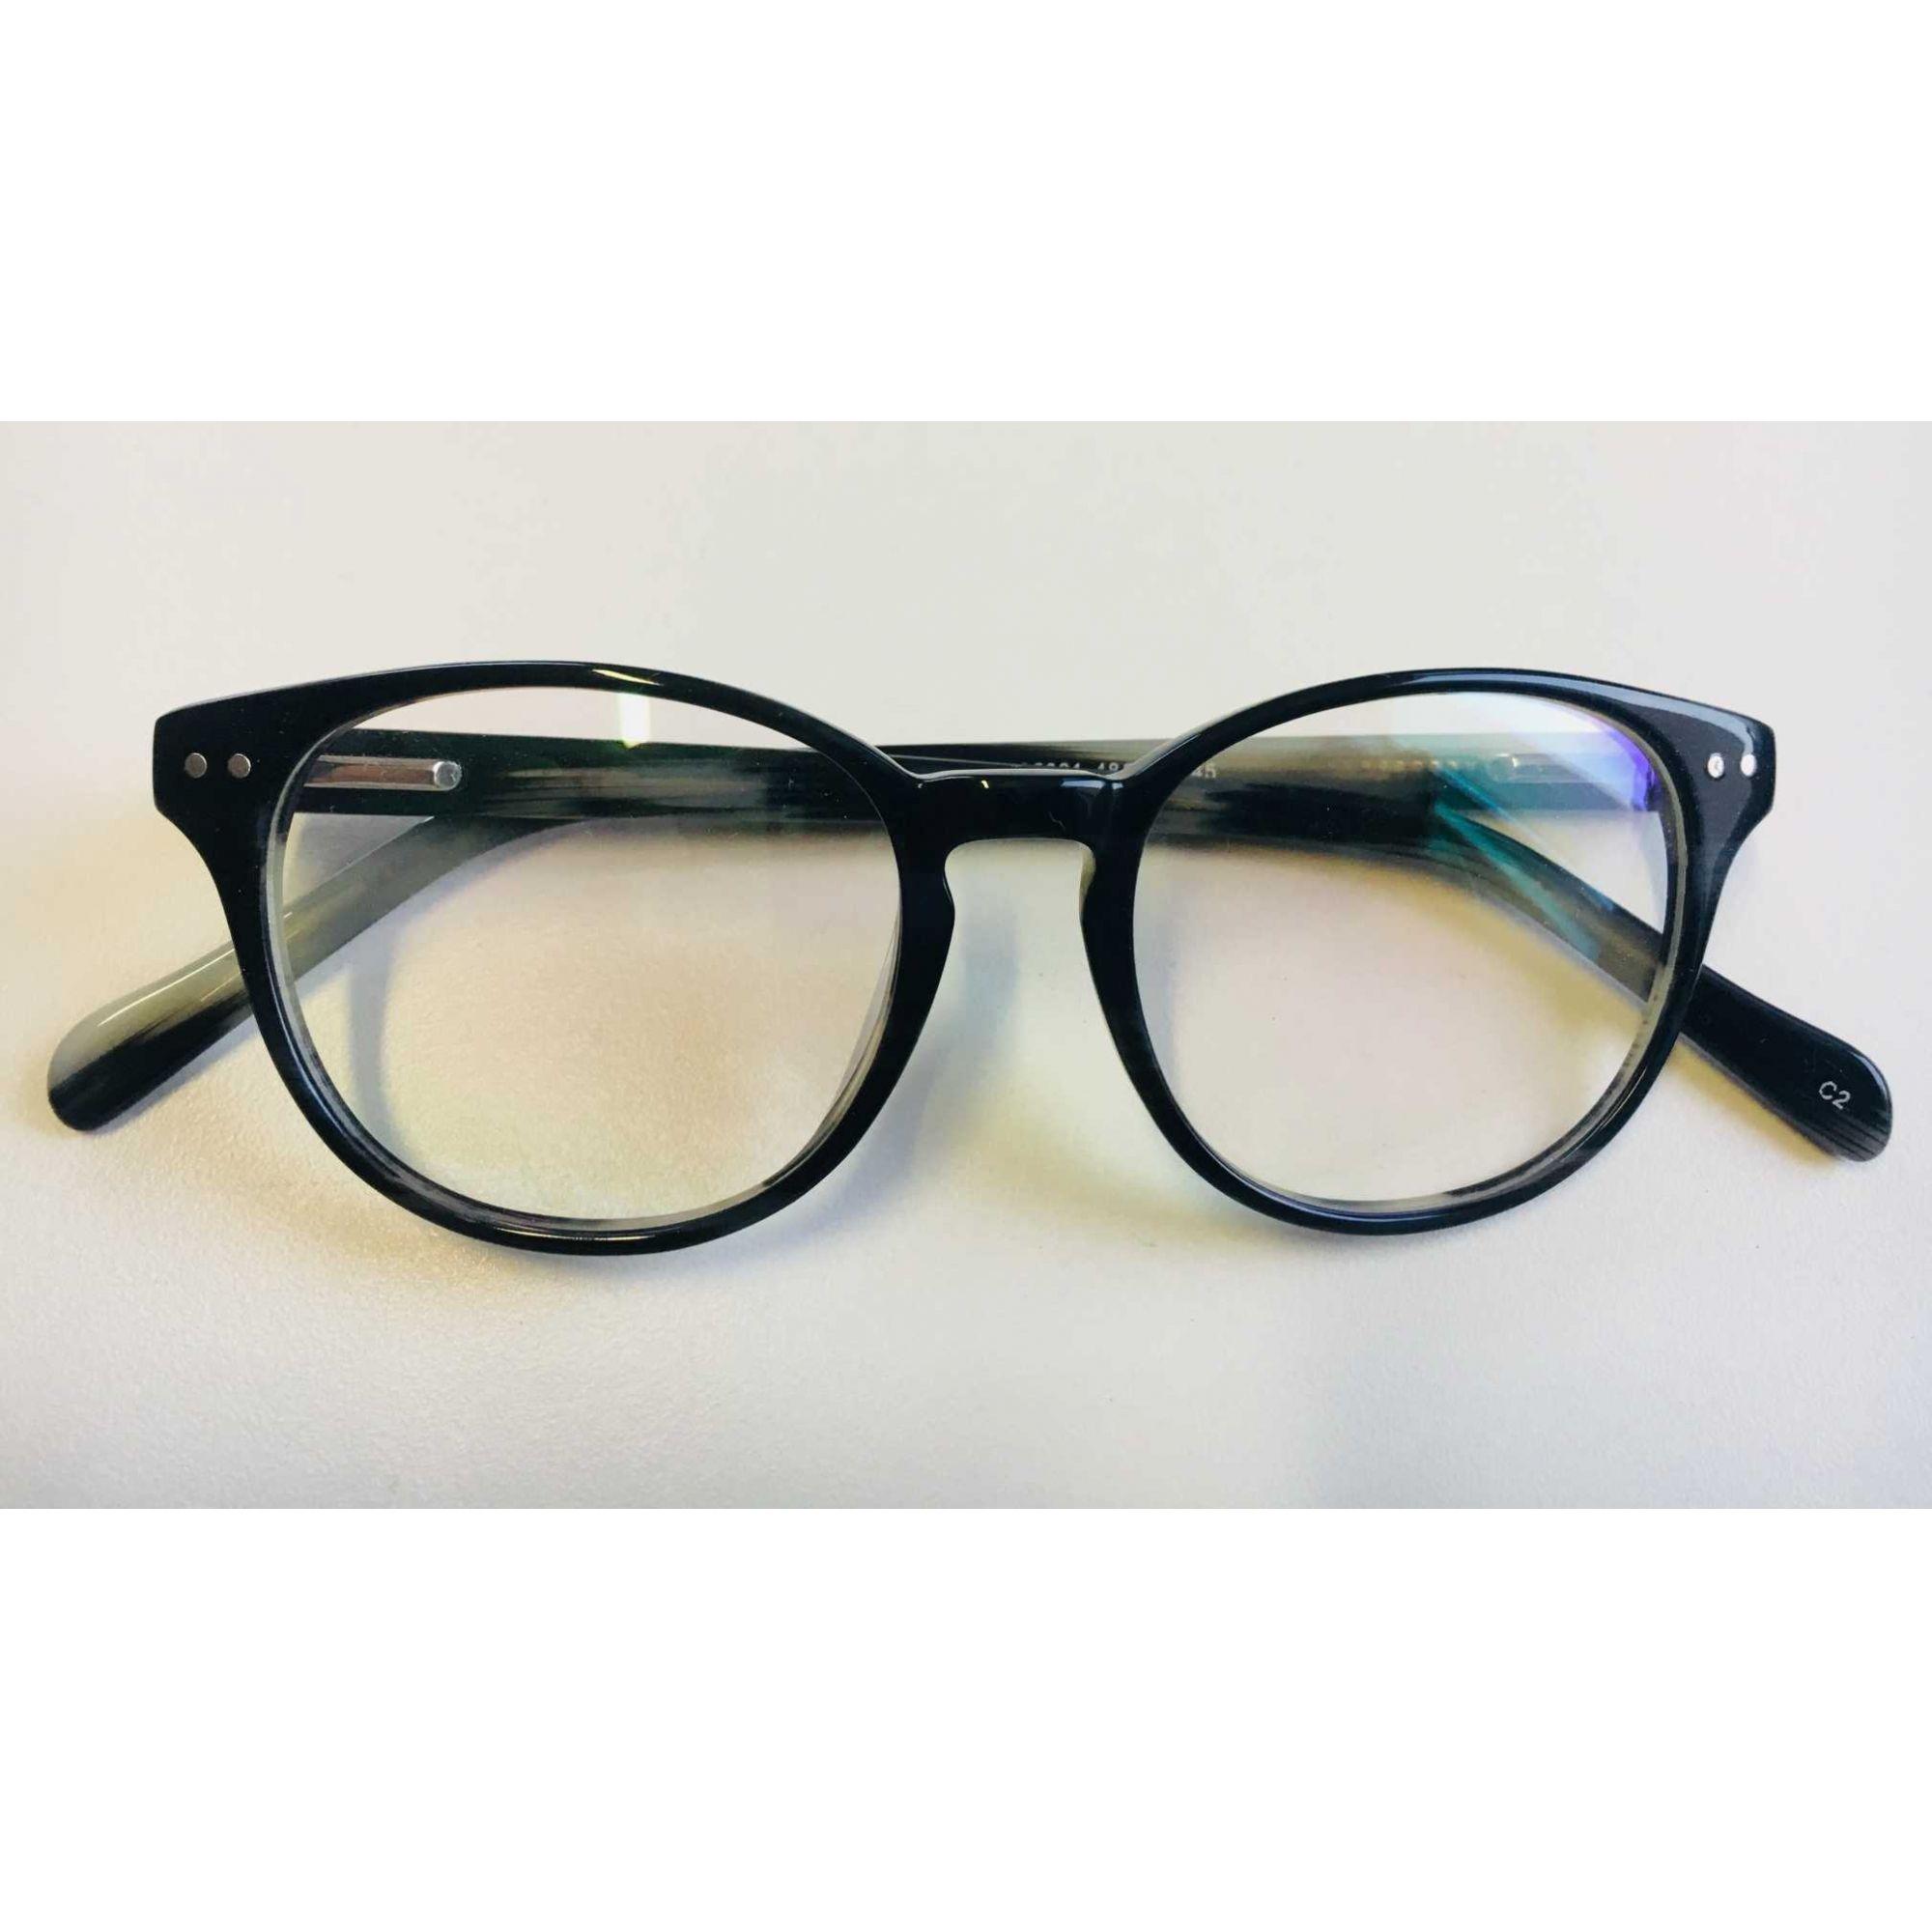 8ec560dcd Armação Óculos Grau Unissex Redondo Acetato J Depp Cinza